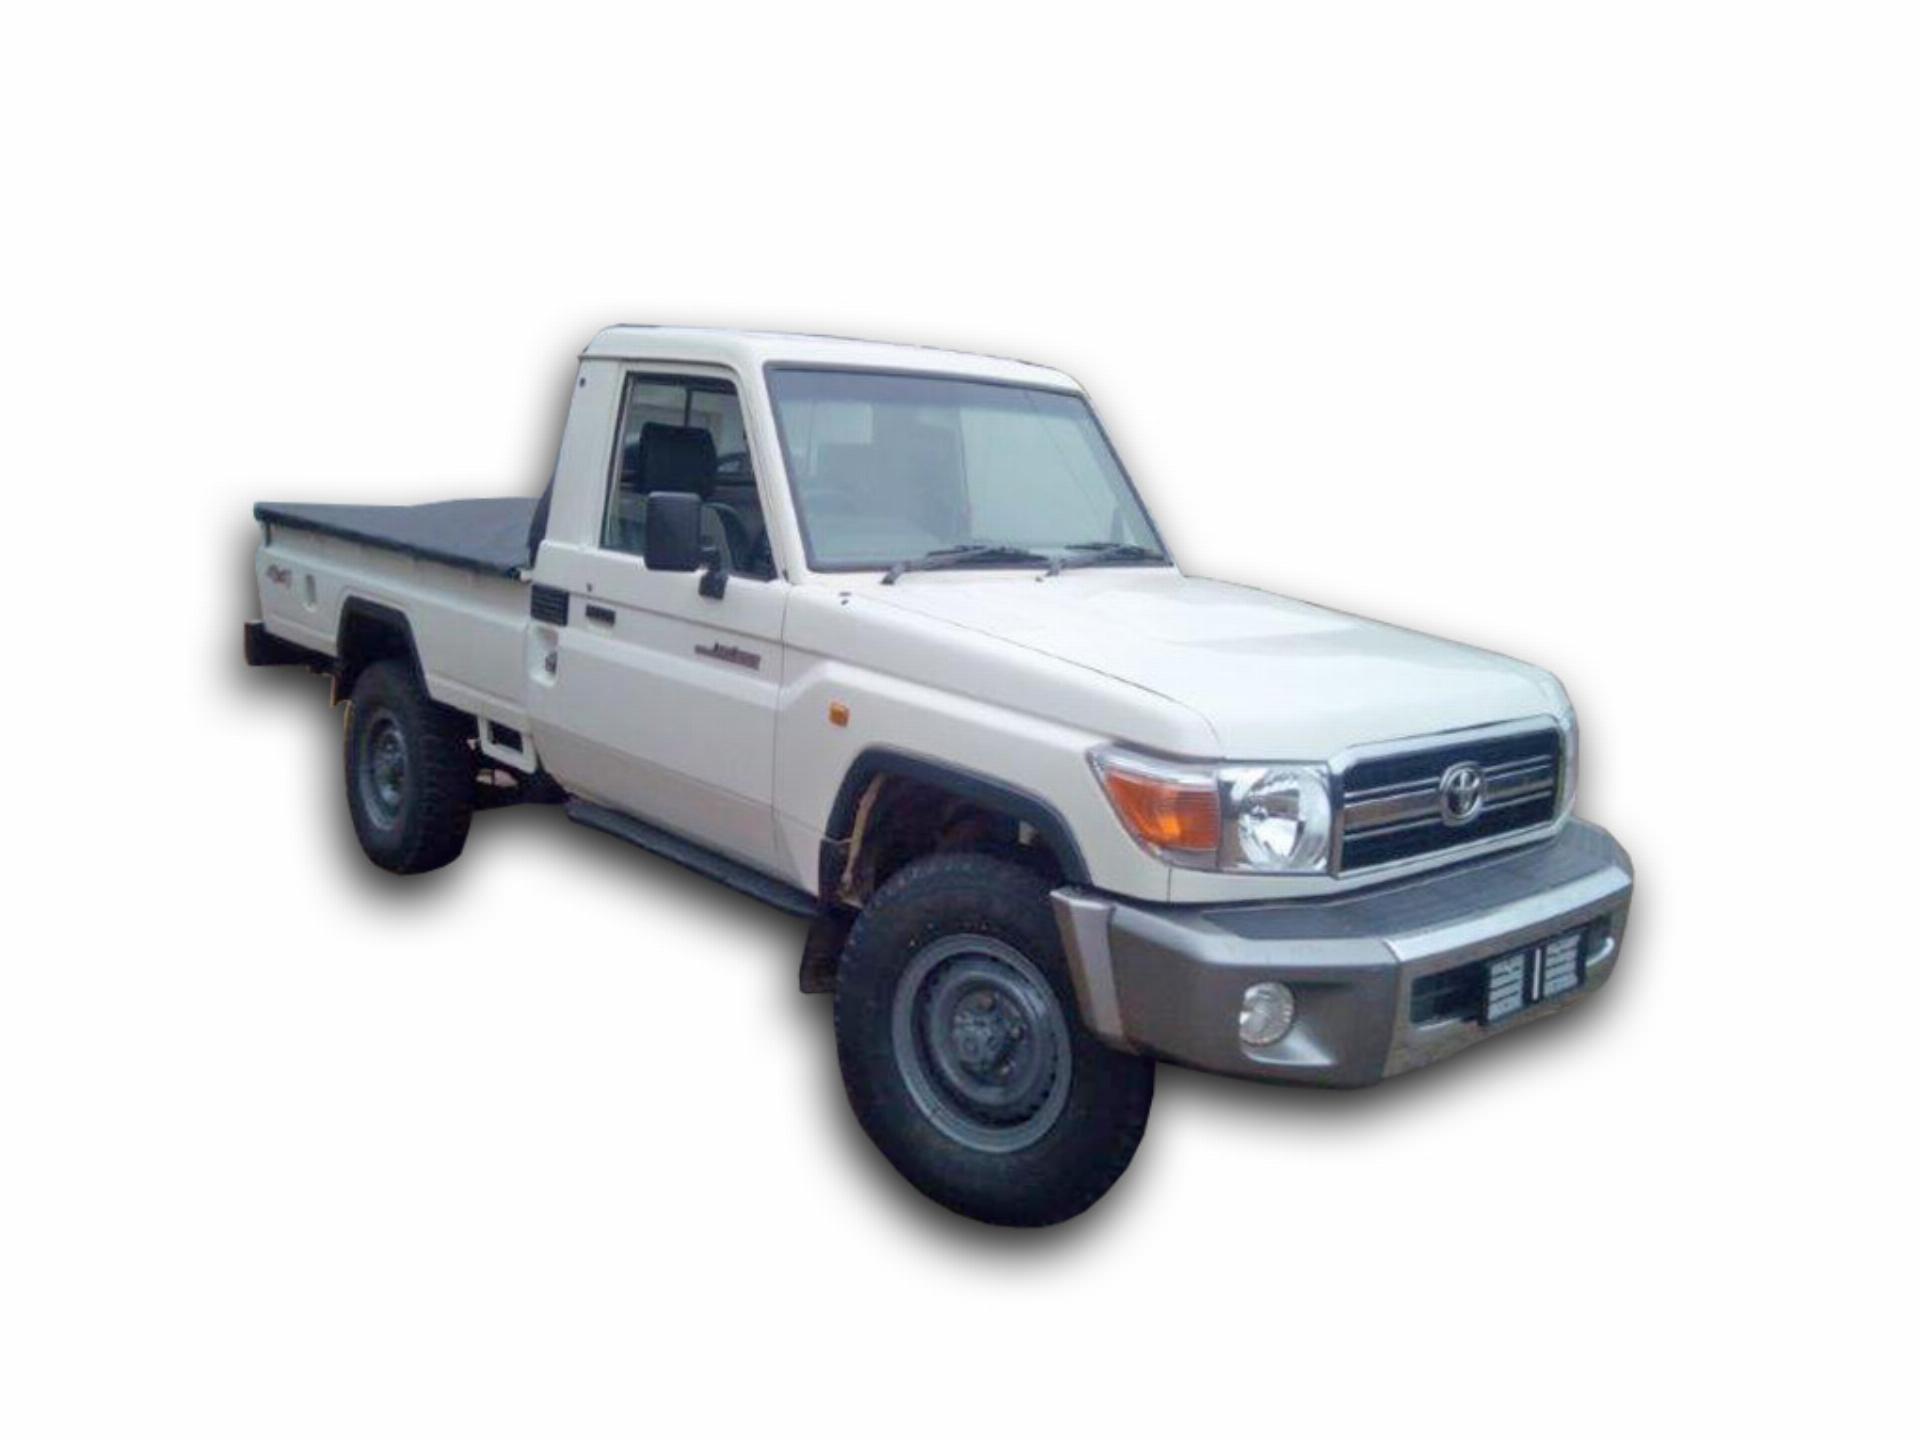 Toyota Land Cruiser Pick UP 4.2 Diesel 4X4 79 Series